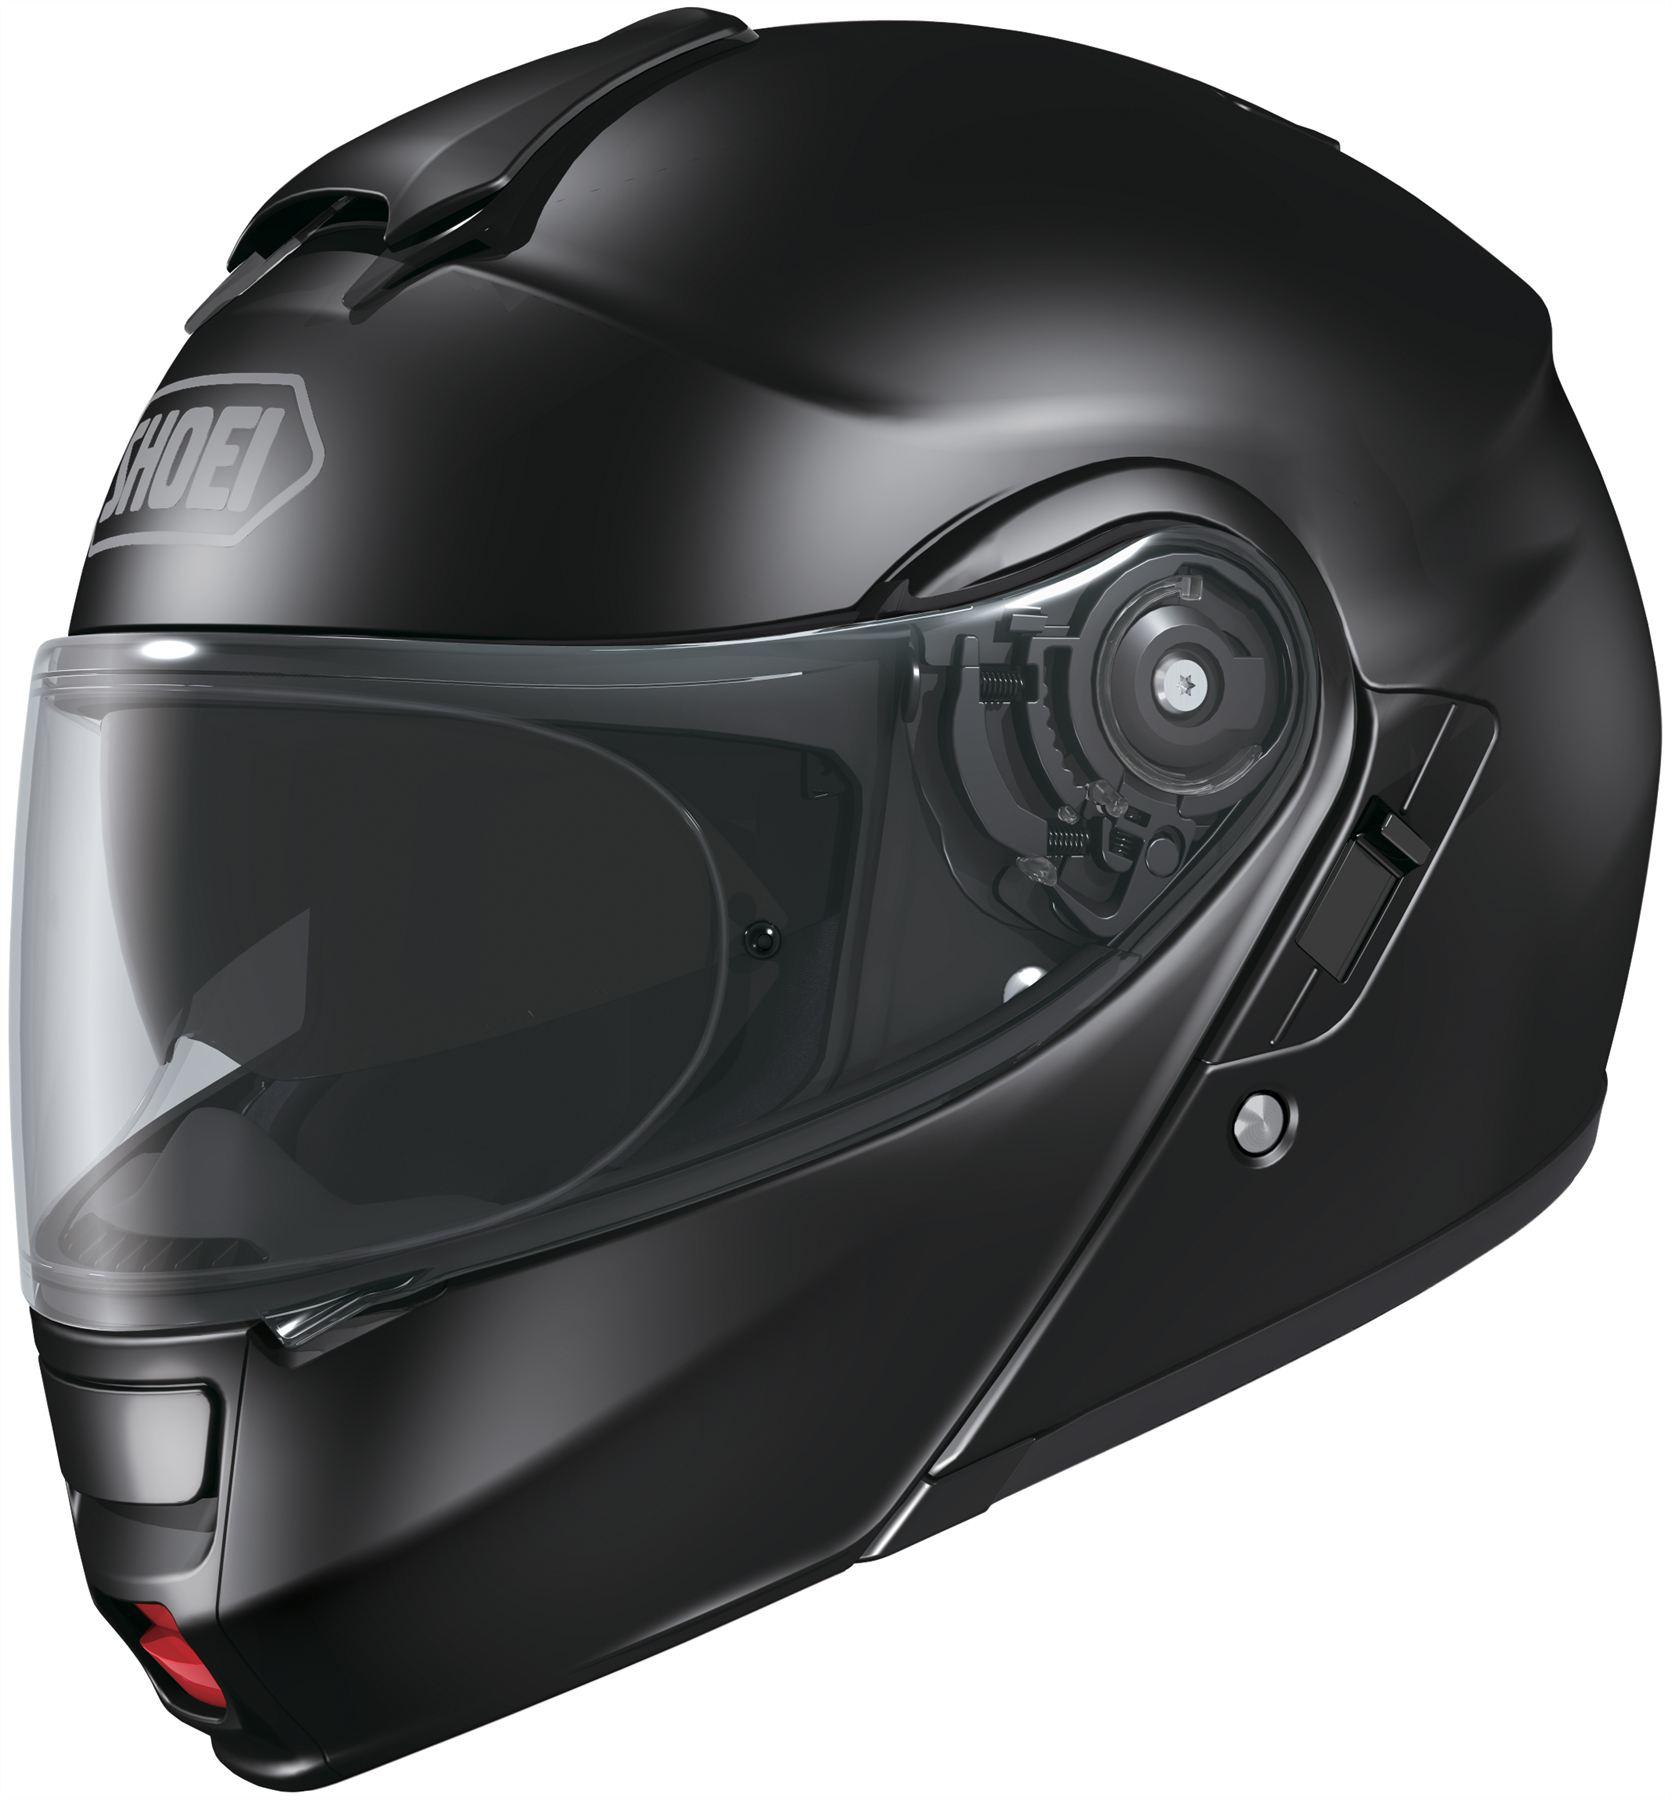 Motorcycle Helmets Dot >> Shoei Neotec Flip Up Modular Motorcycle Helmet Dot Approved Ebay